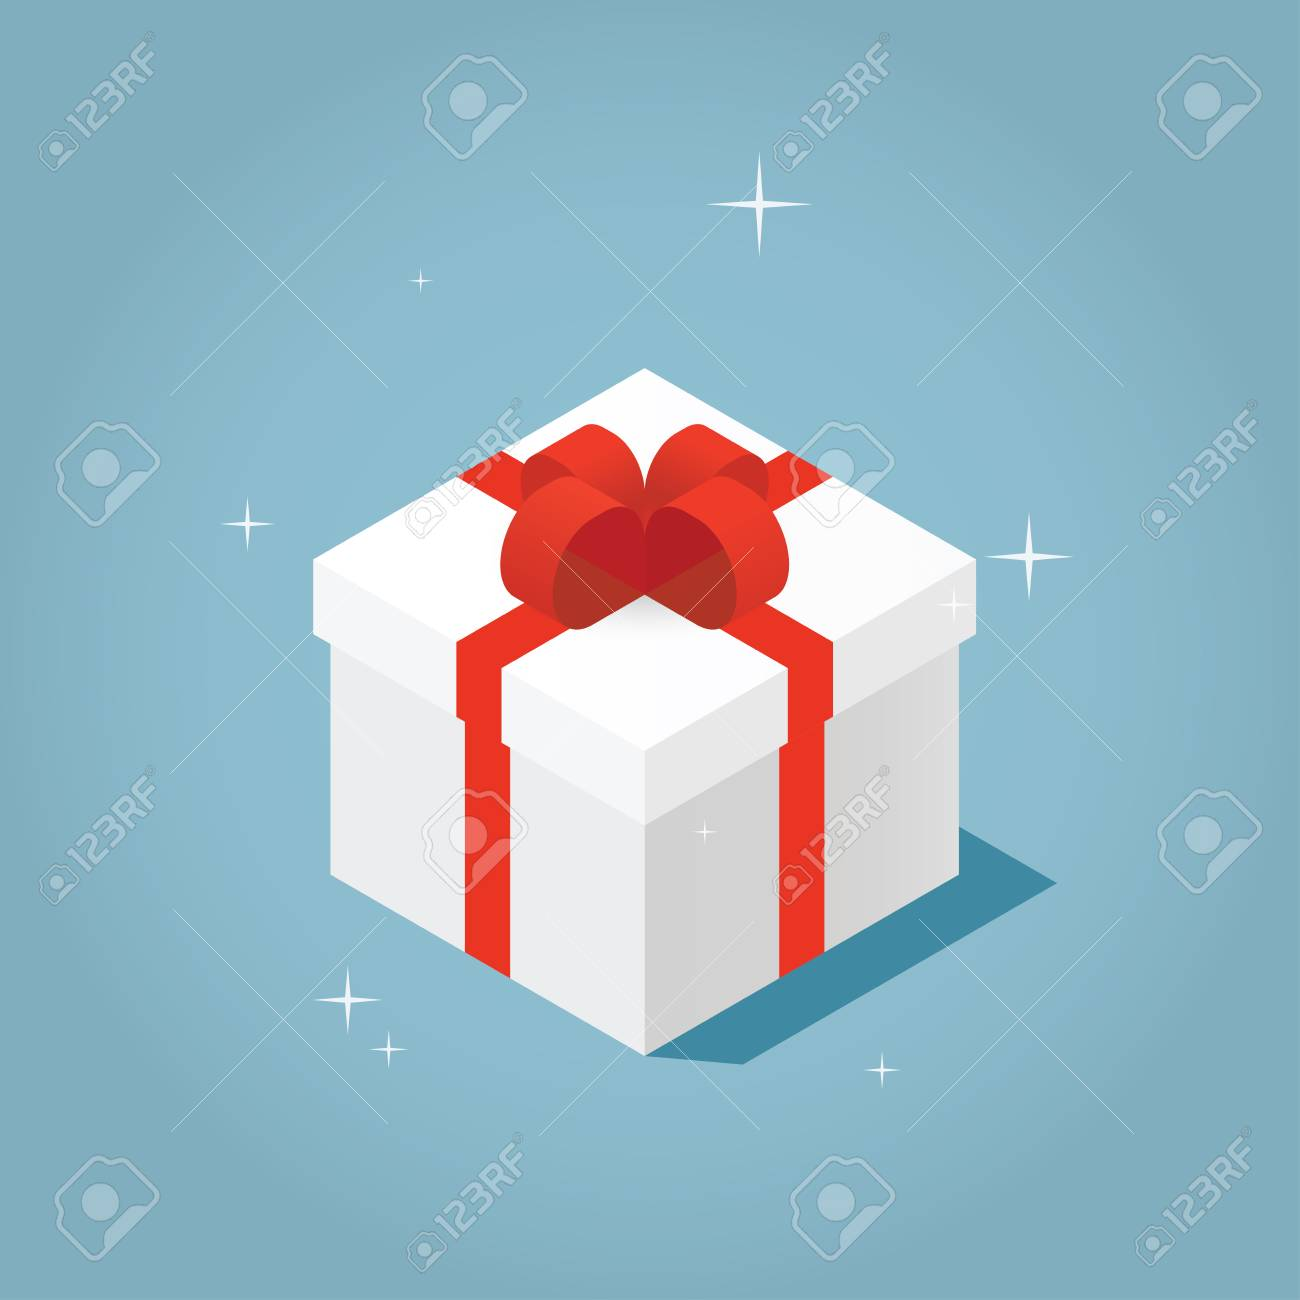 Isometric Vector Present Box Illustration The Christmas Or Birthday